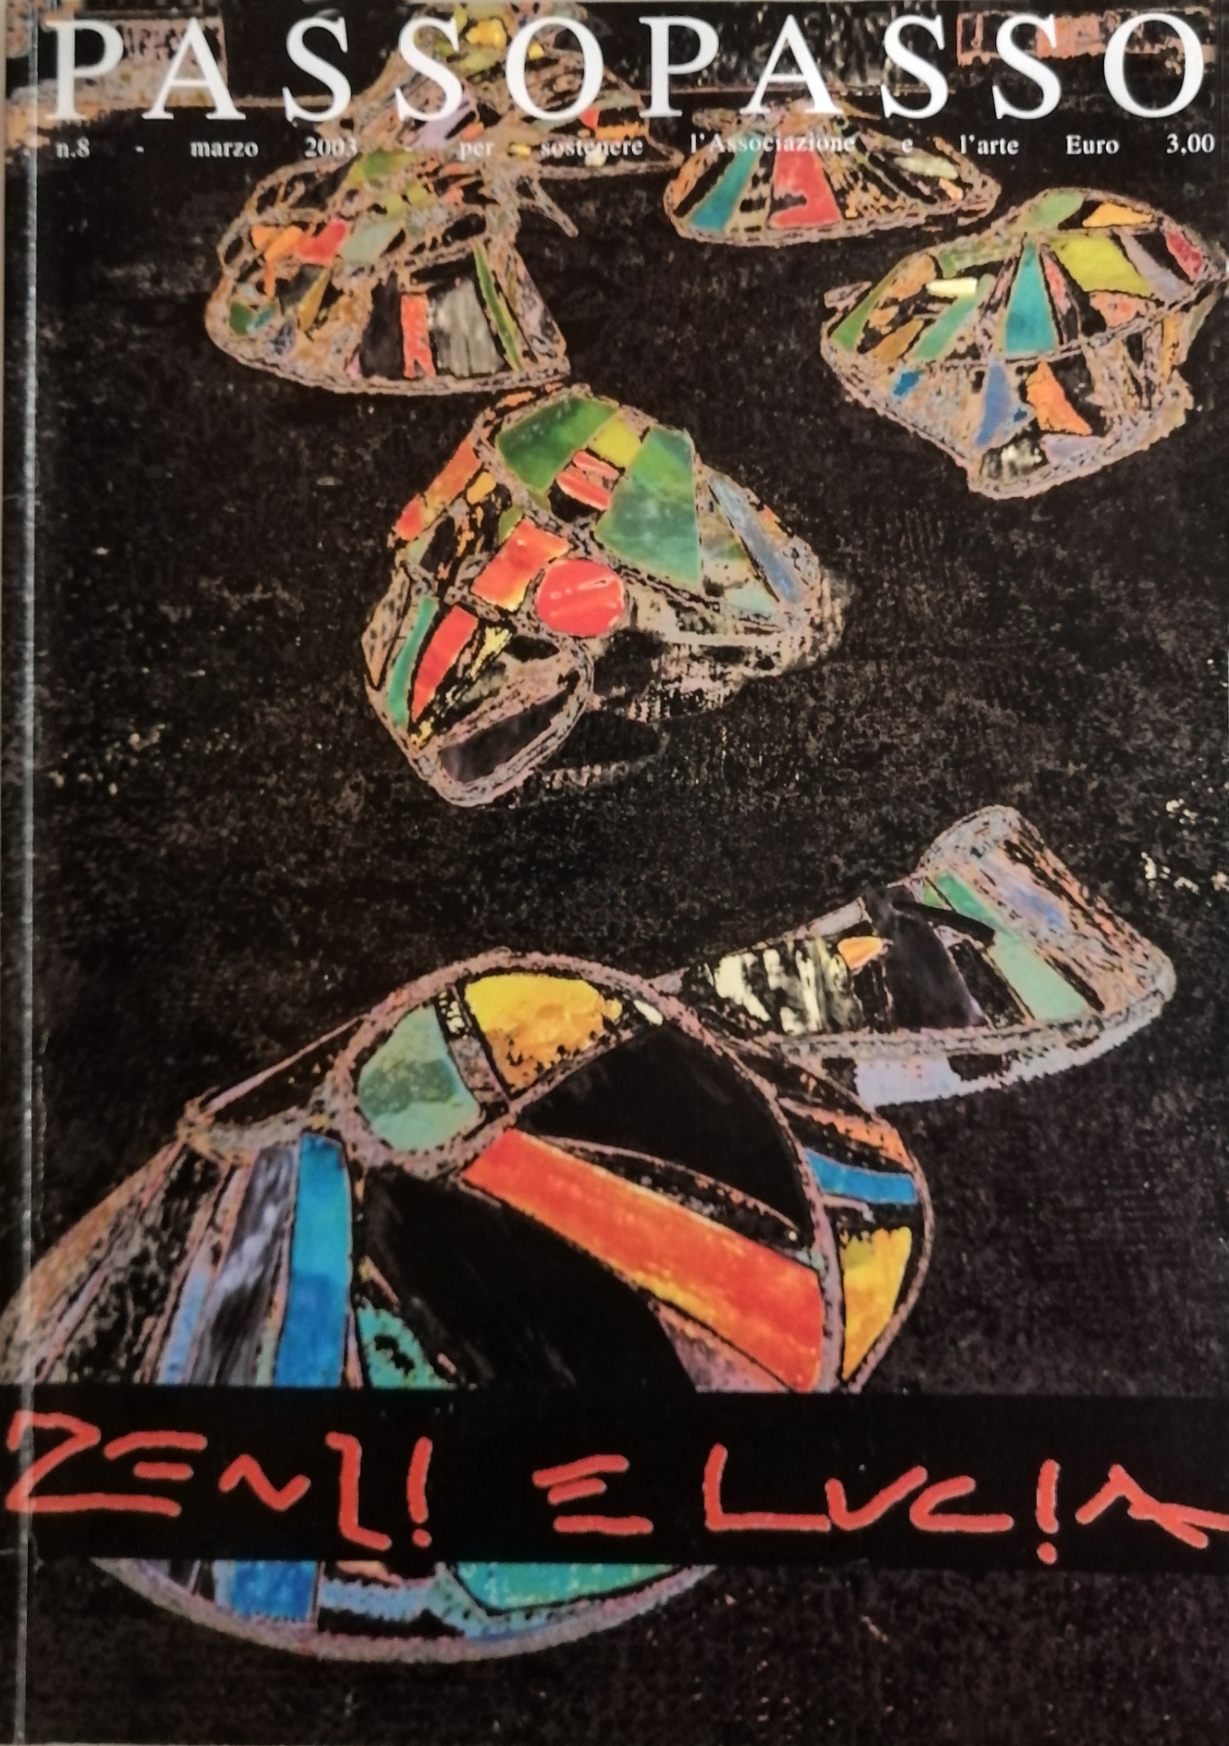 2003 Passopasso 8 rivista catalogo - Bibliography/ Catalogues